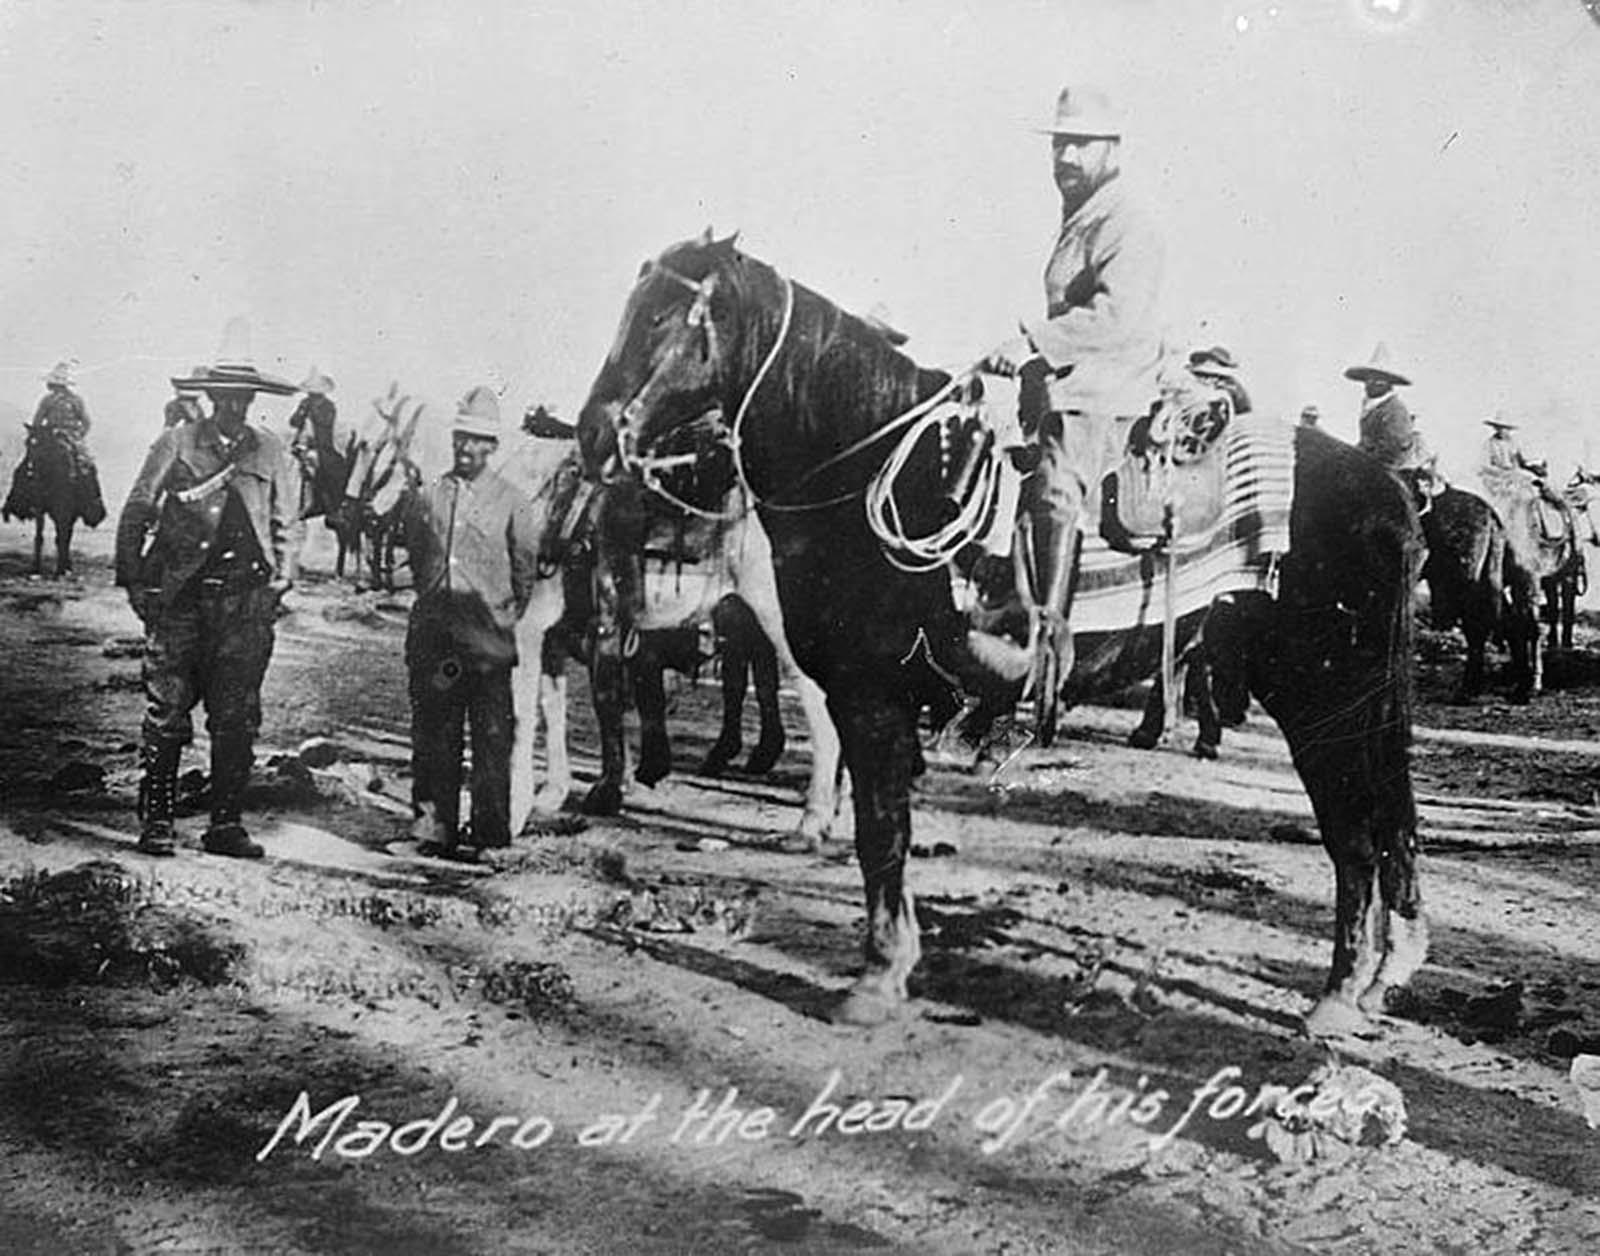 Madero 1910-ben erőinek élén.